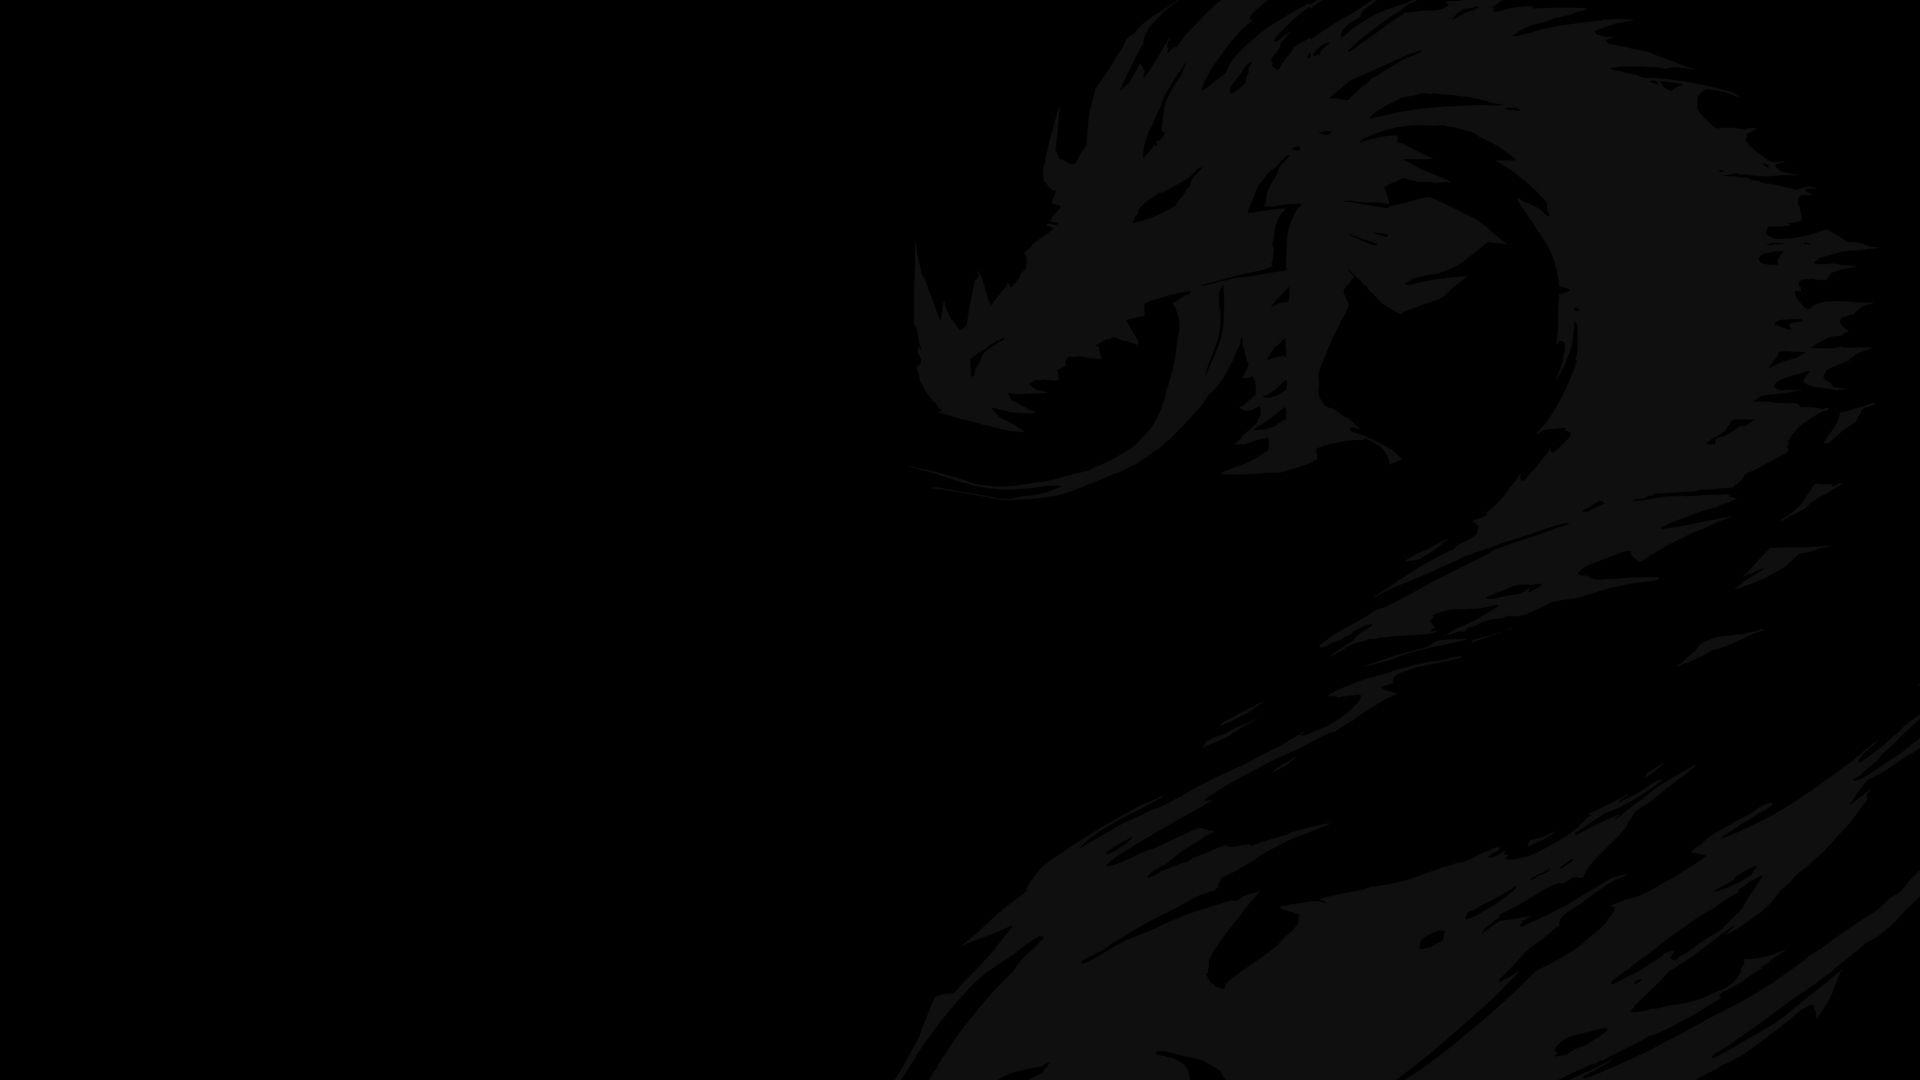 Black Wallpapers 1080p Plain Black Wallpaper Pure Black Wallpaper Dark Black Wallpaper